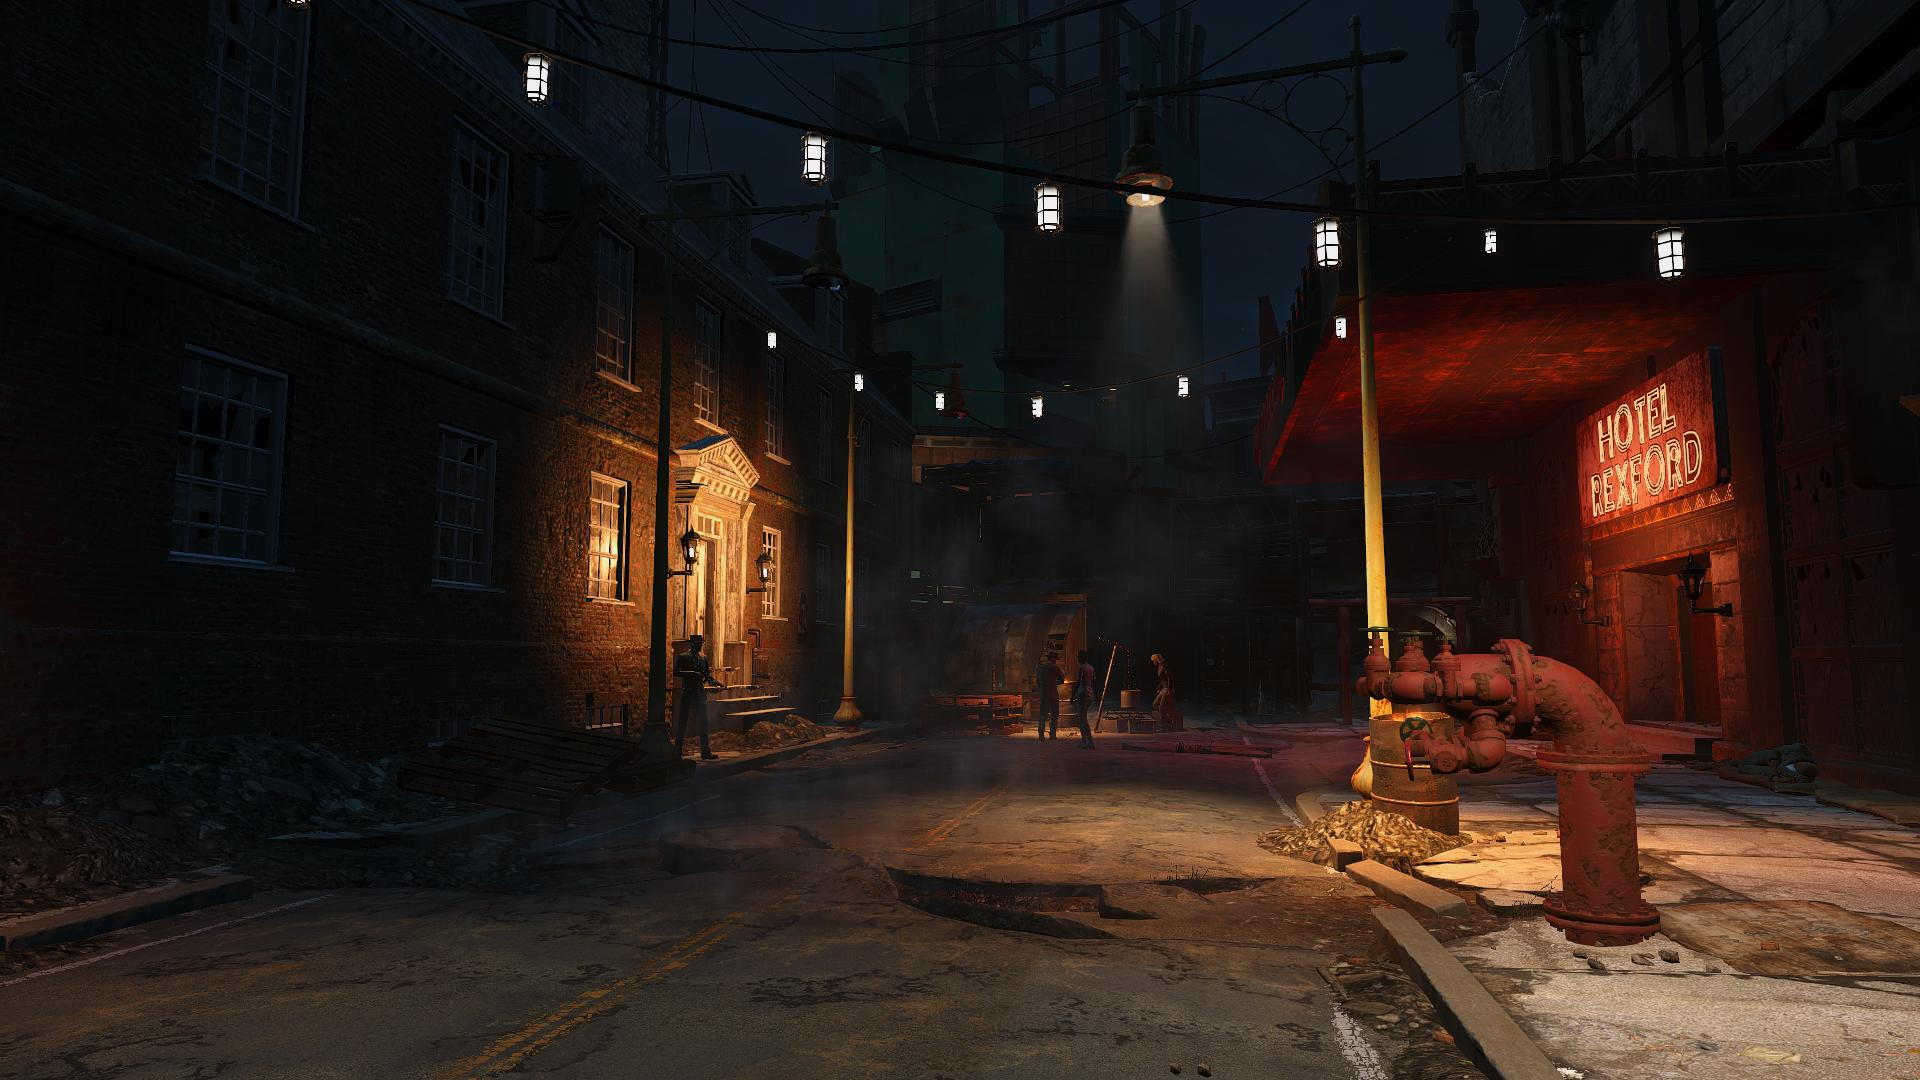 000505.Jpg - Fallout 4